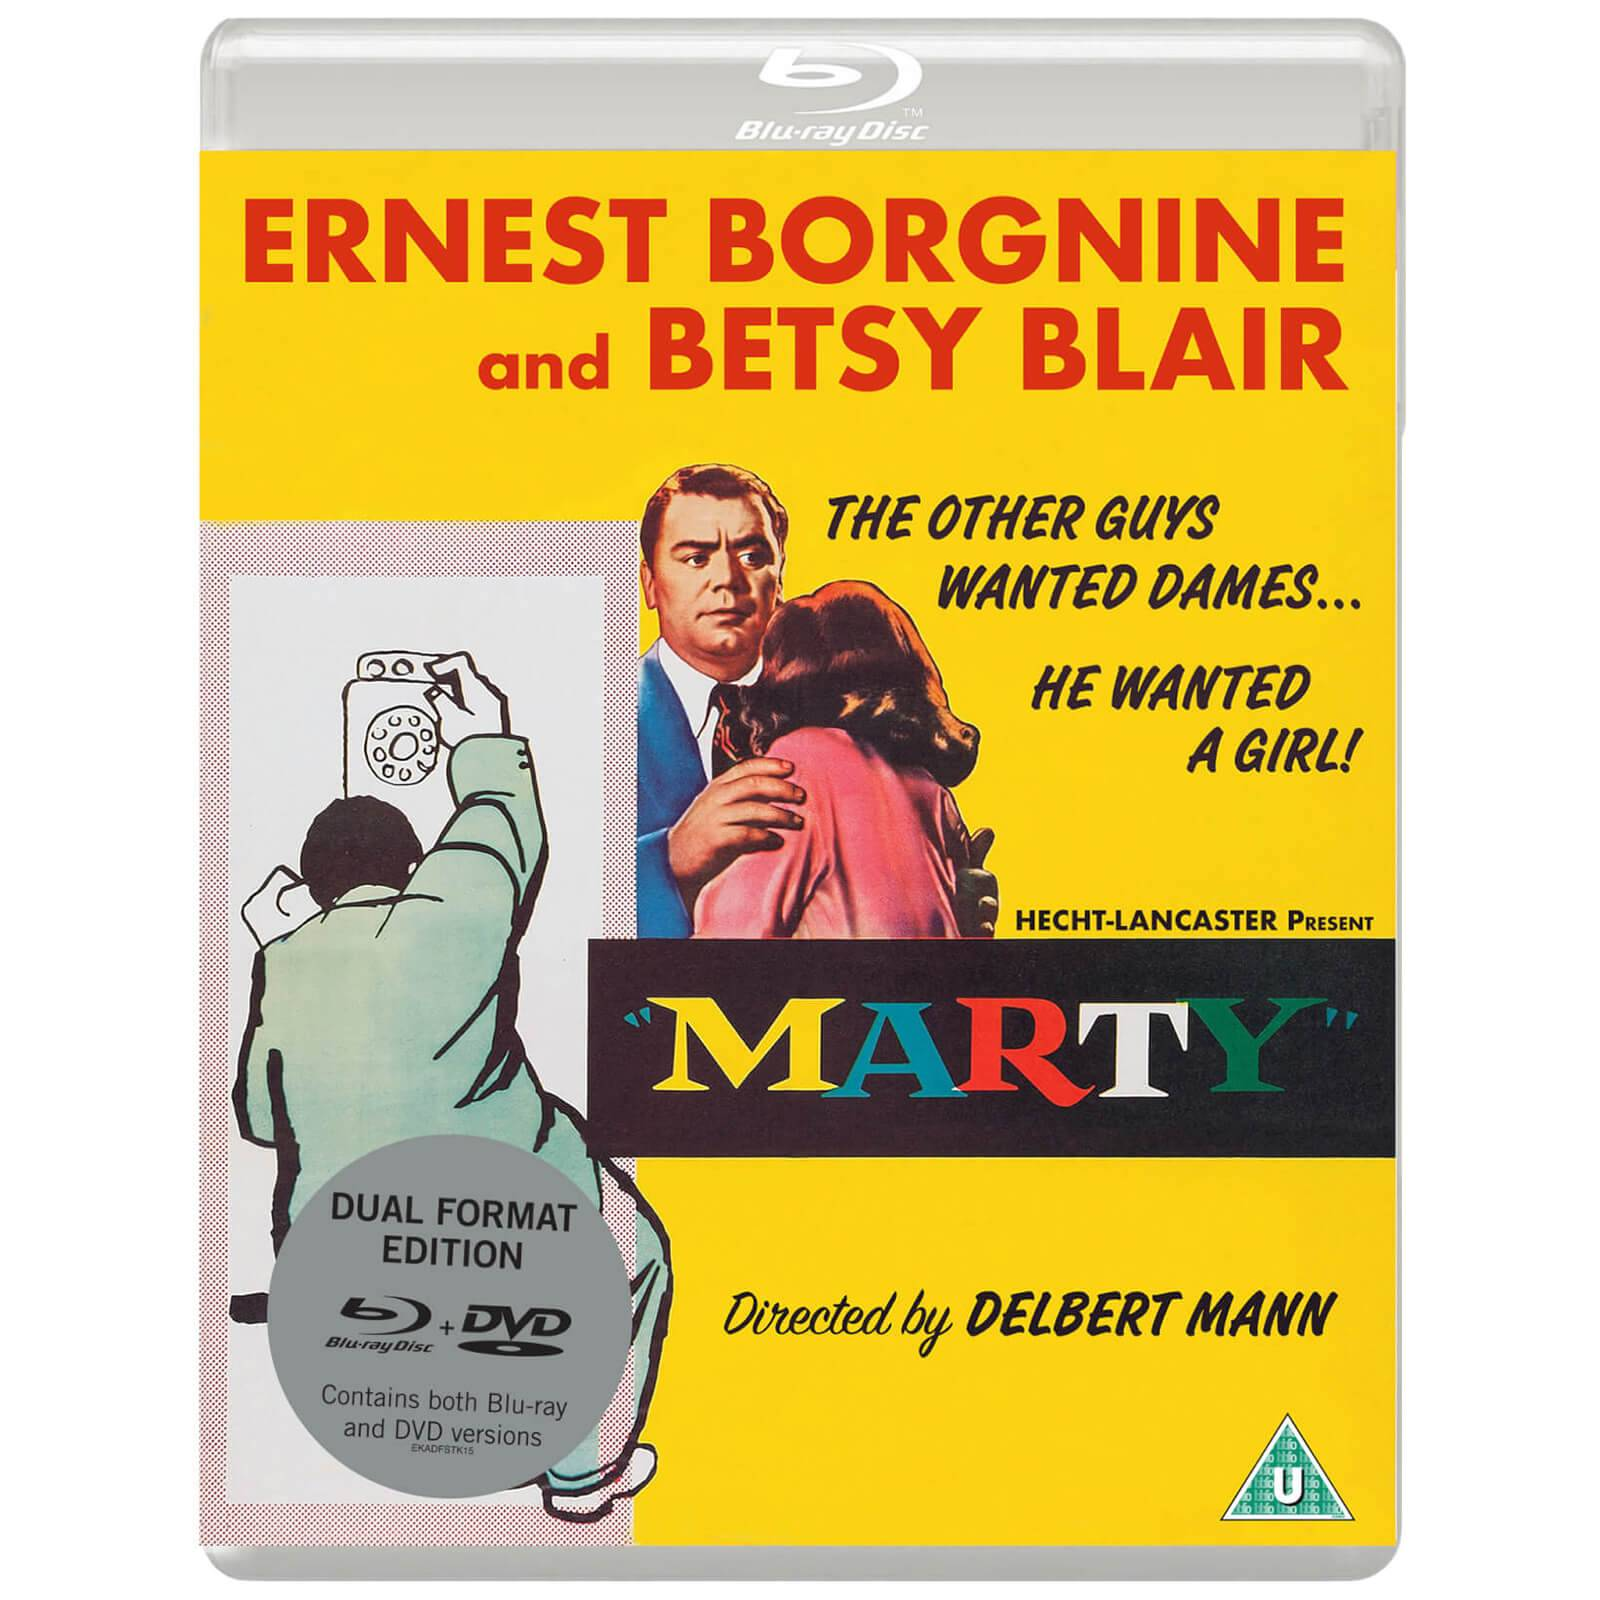 Marty - Dual Format (Blu-ray & DVD)